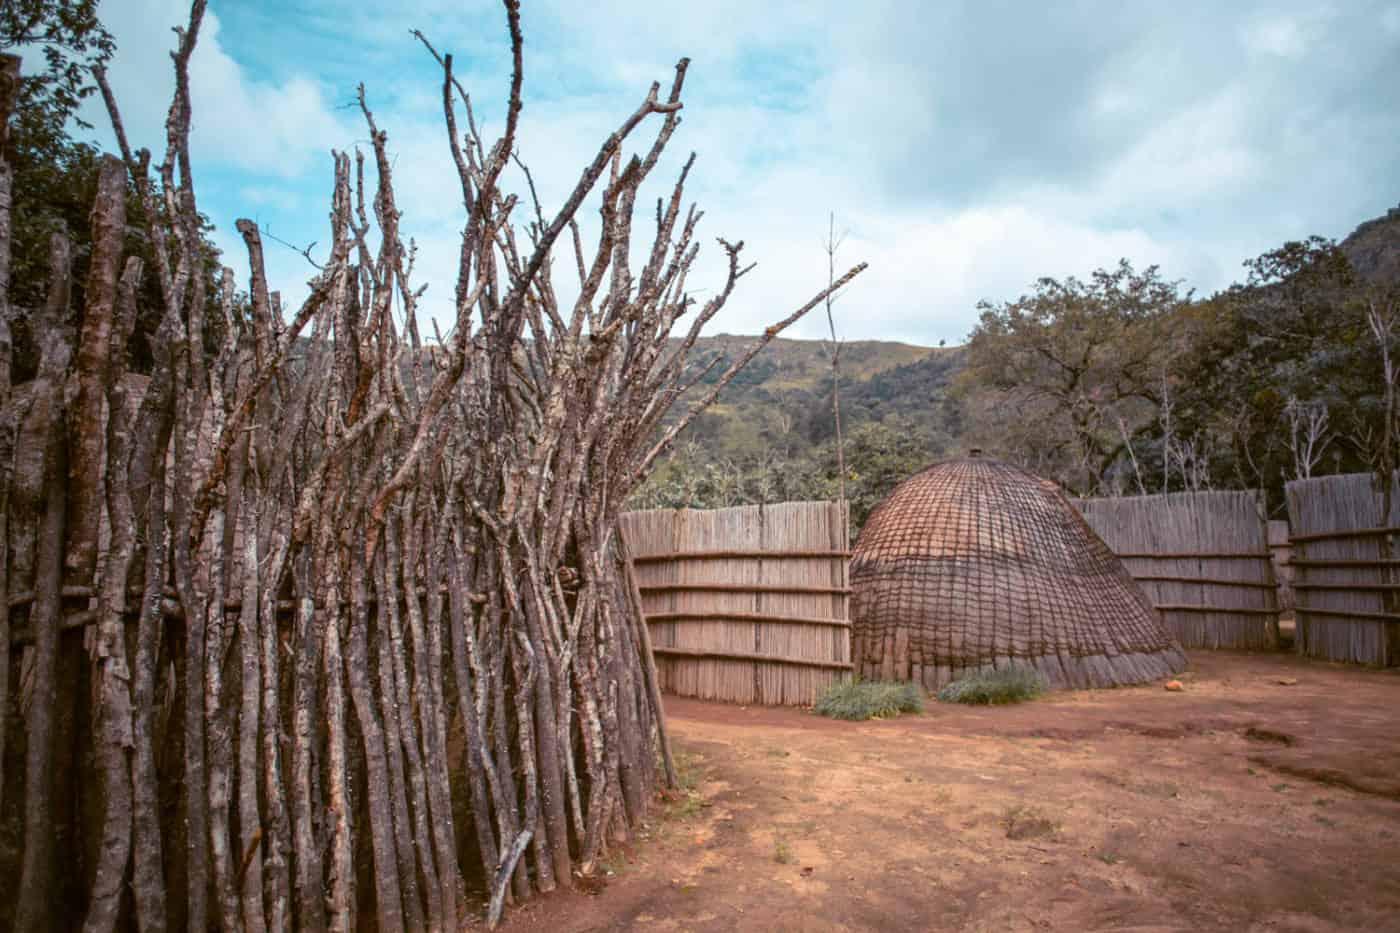 Swaziland Manzini swazi cultural village